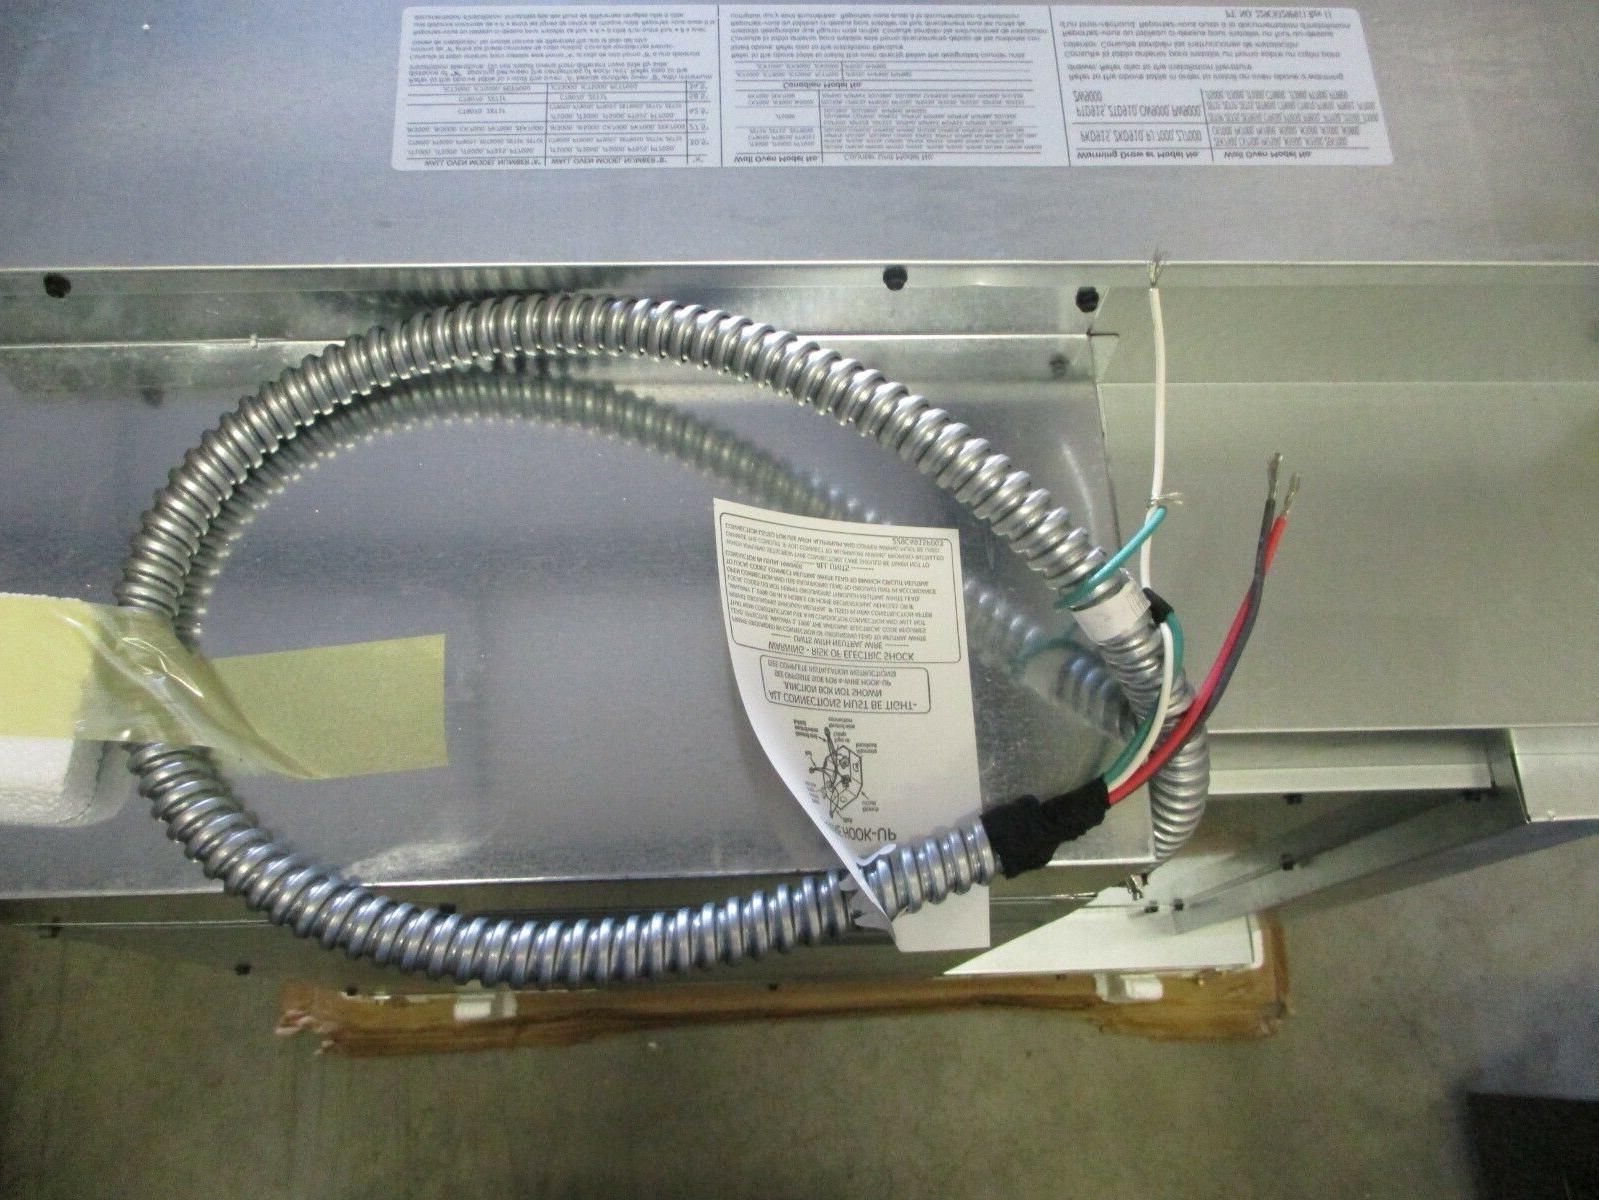 GE Steel Single Electric Wall Oven